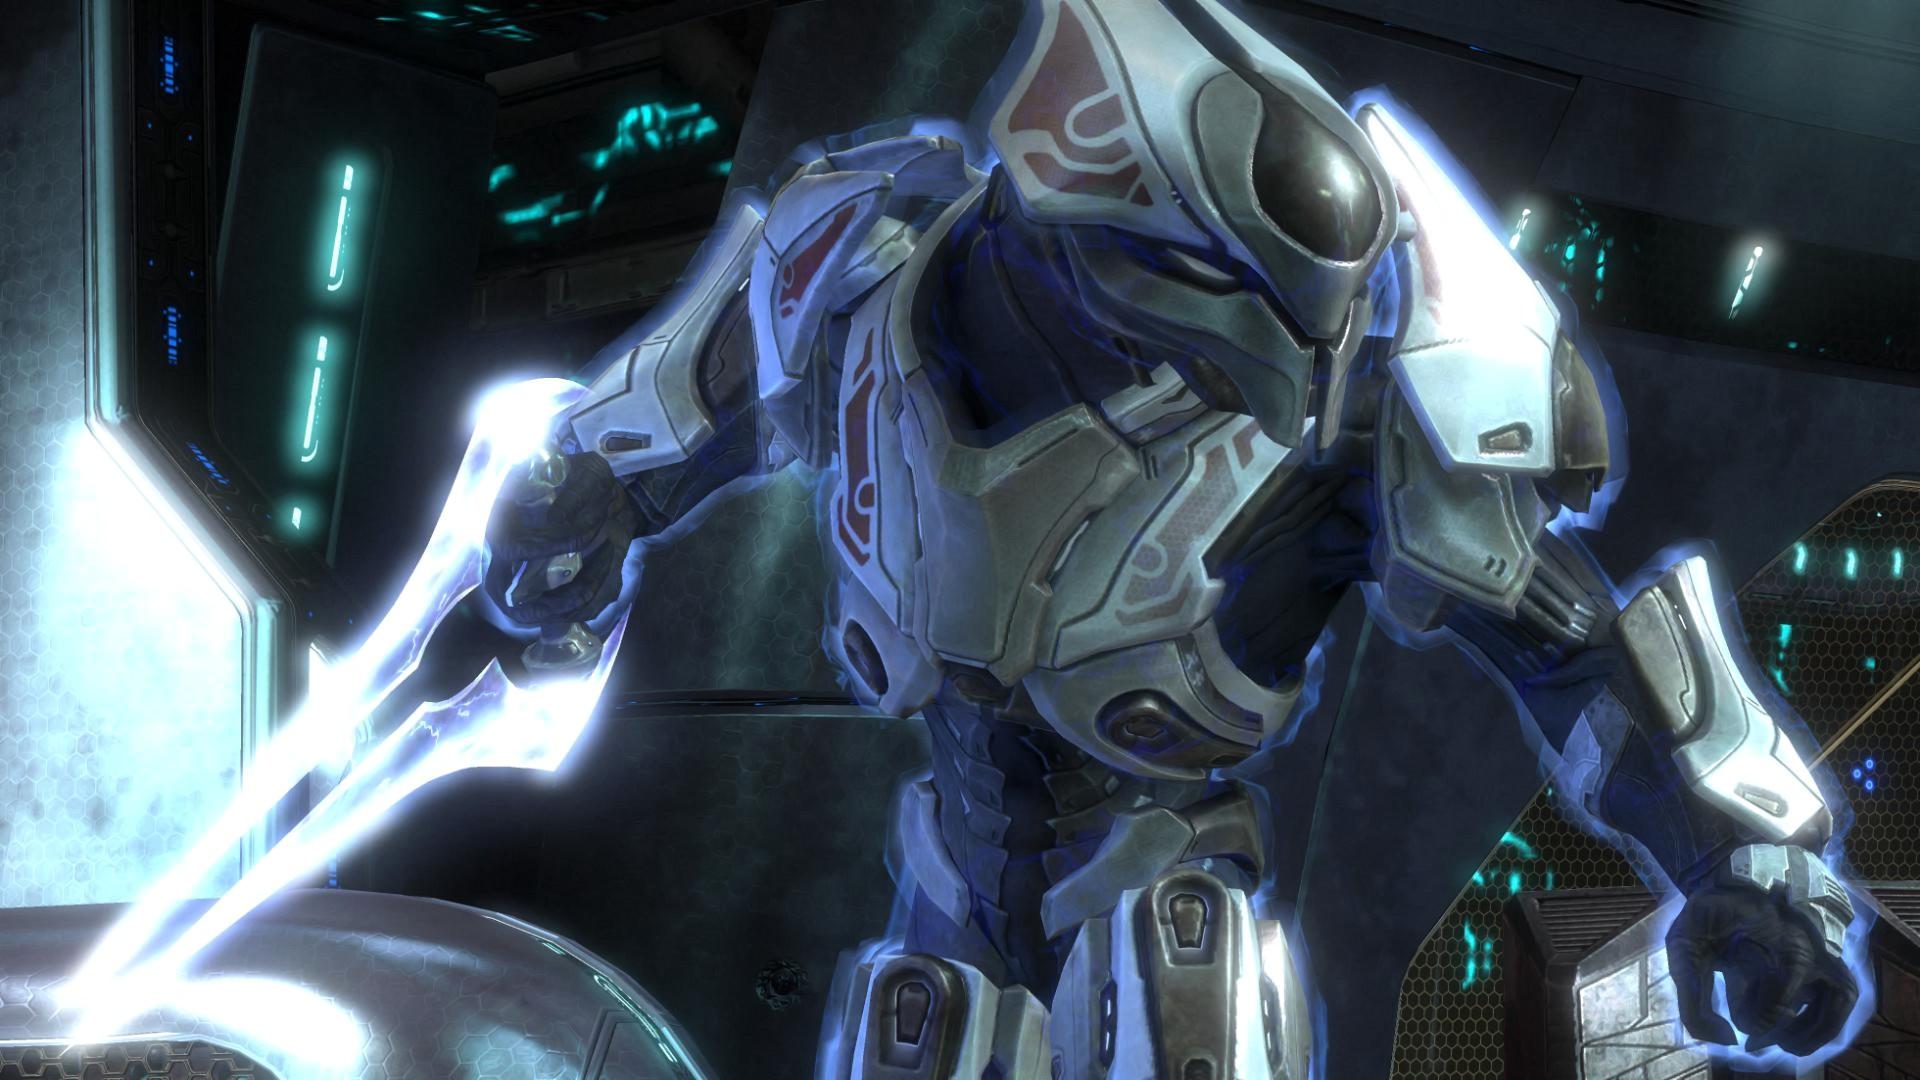 Halo-Reach-Covenant-Files-4-10-SANGHEILI-ELITE-ULTRA-+-ENERGY-SWORD.jpg